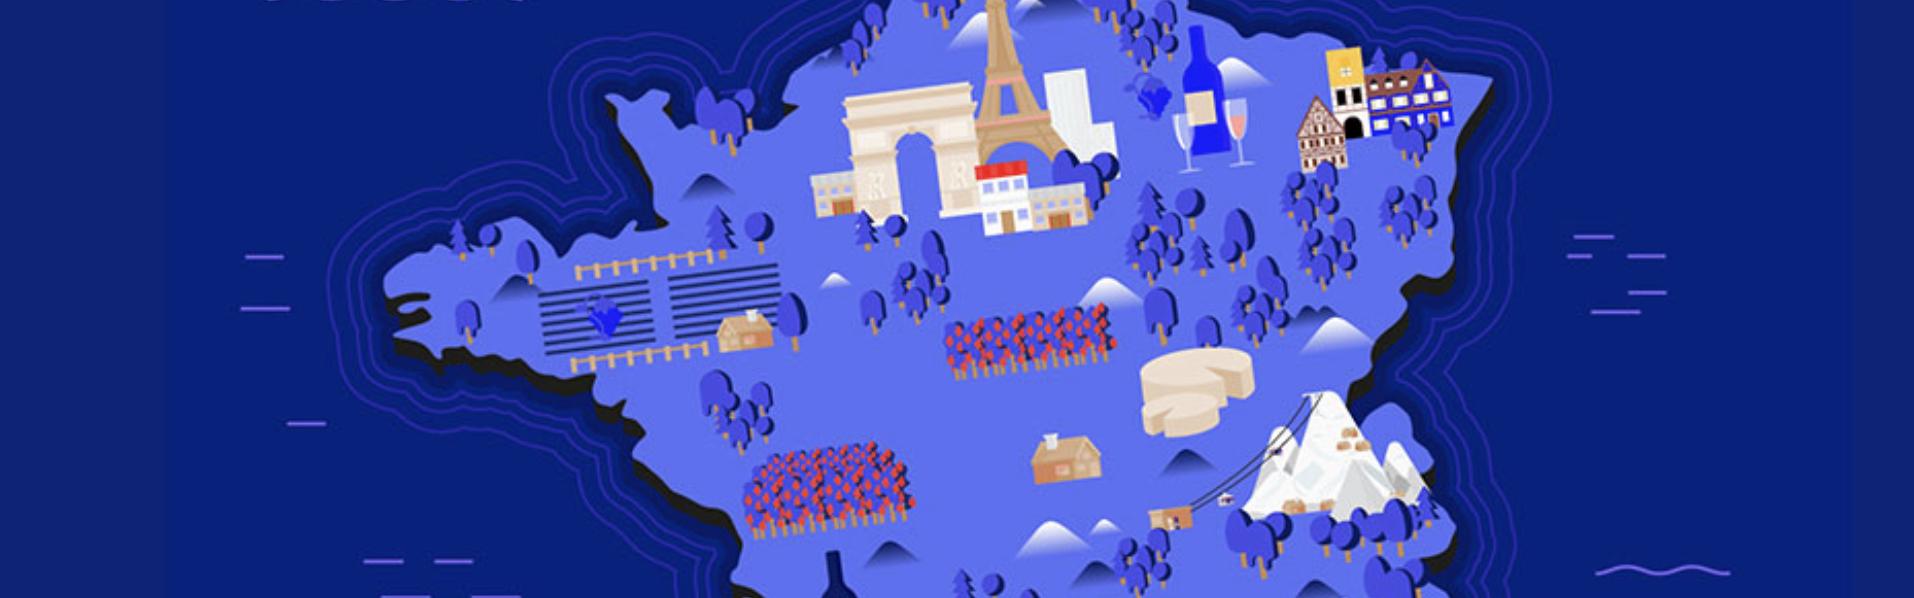 etude-social-media-france-tourisme-2018